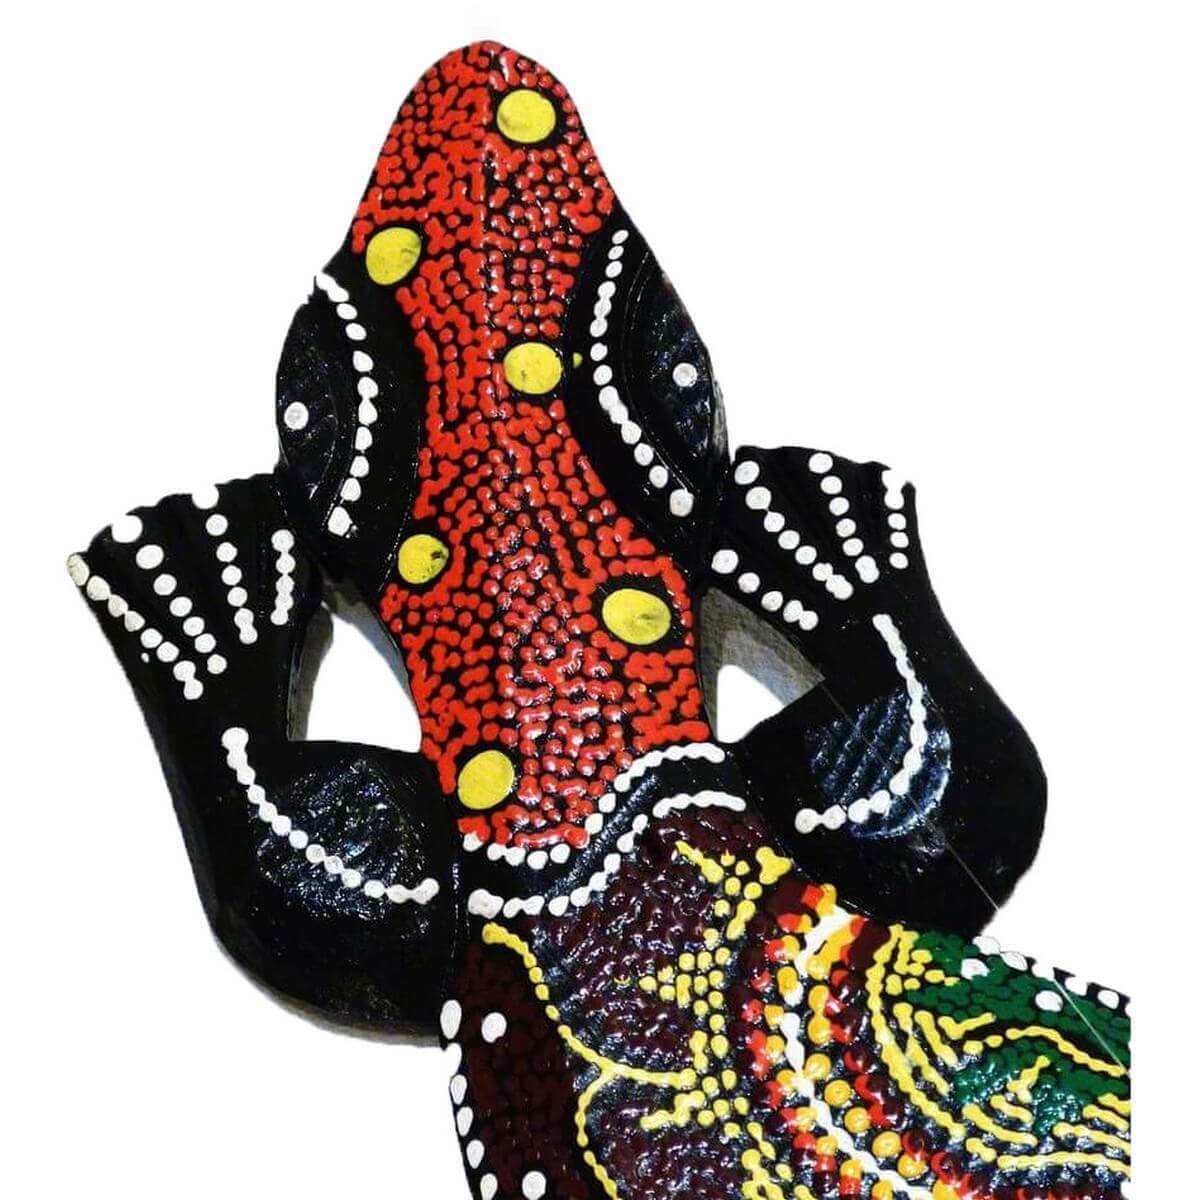 Gecko echse deko figur wanddeko holzfigur wandfigur salamander - Wanddeko eidechse ...